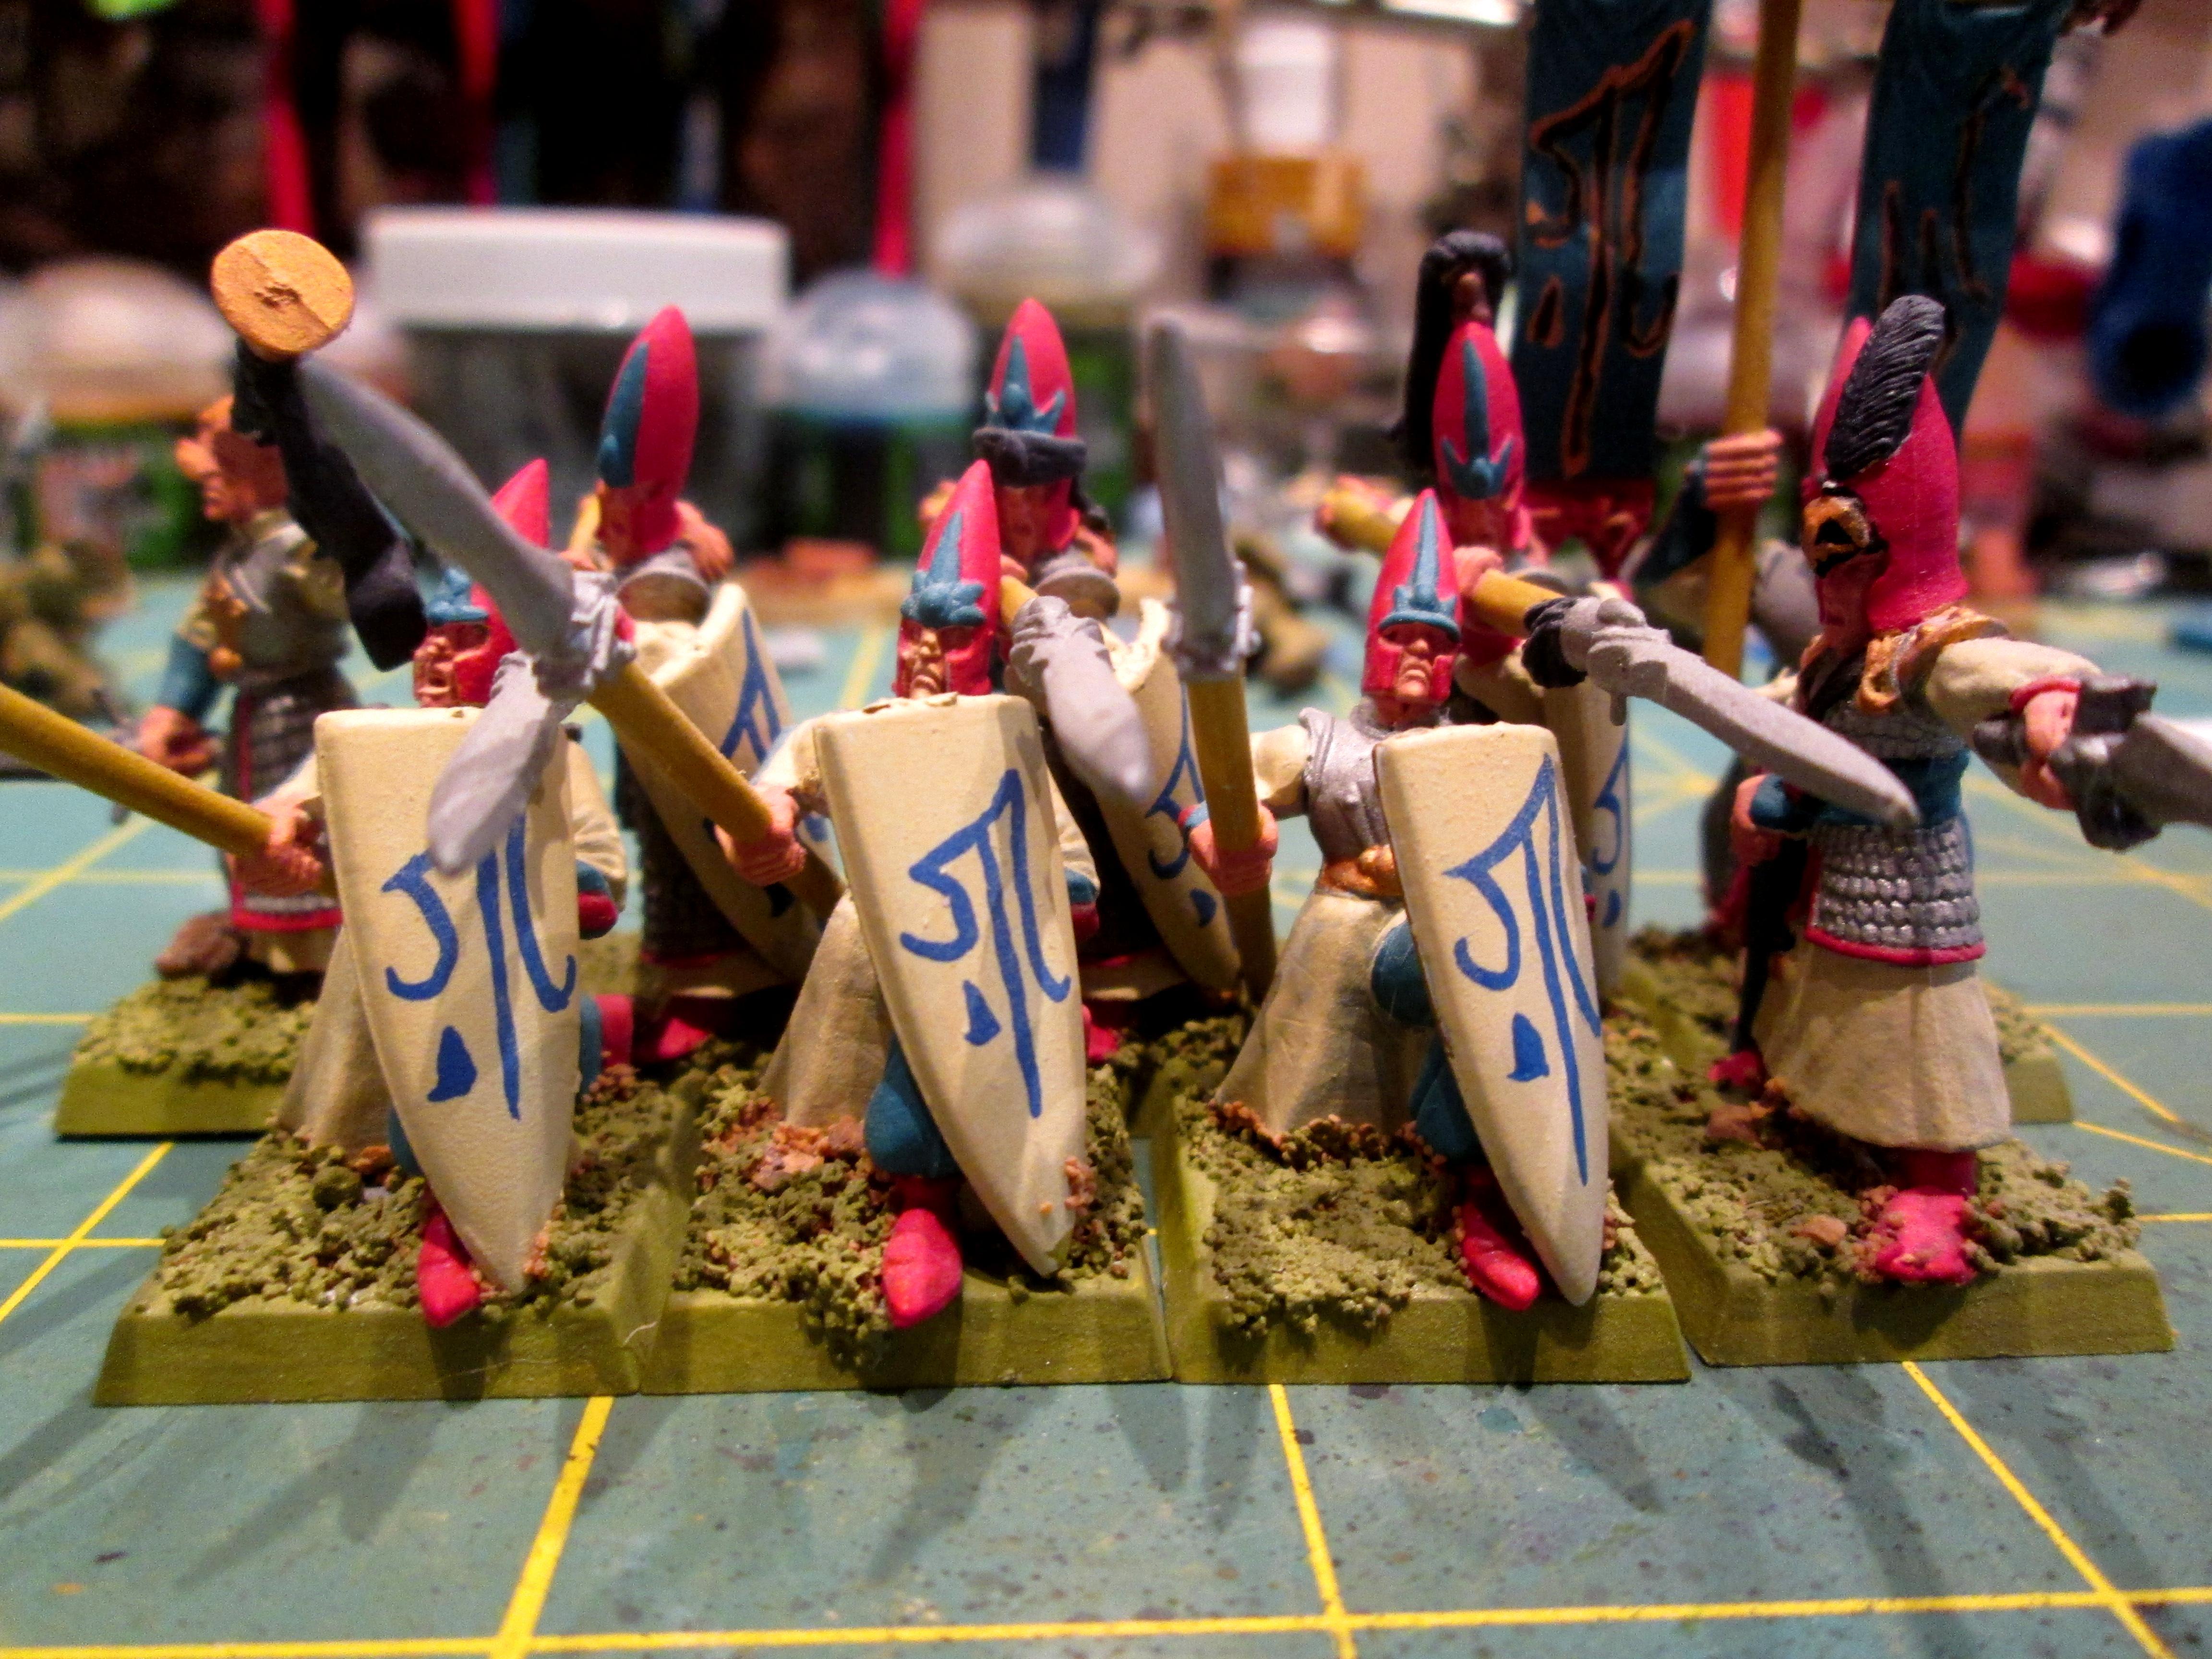 Bowmen, Harathoi, High Elves, Lothern, Seaguard, Spearmen, Wfb